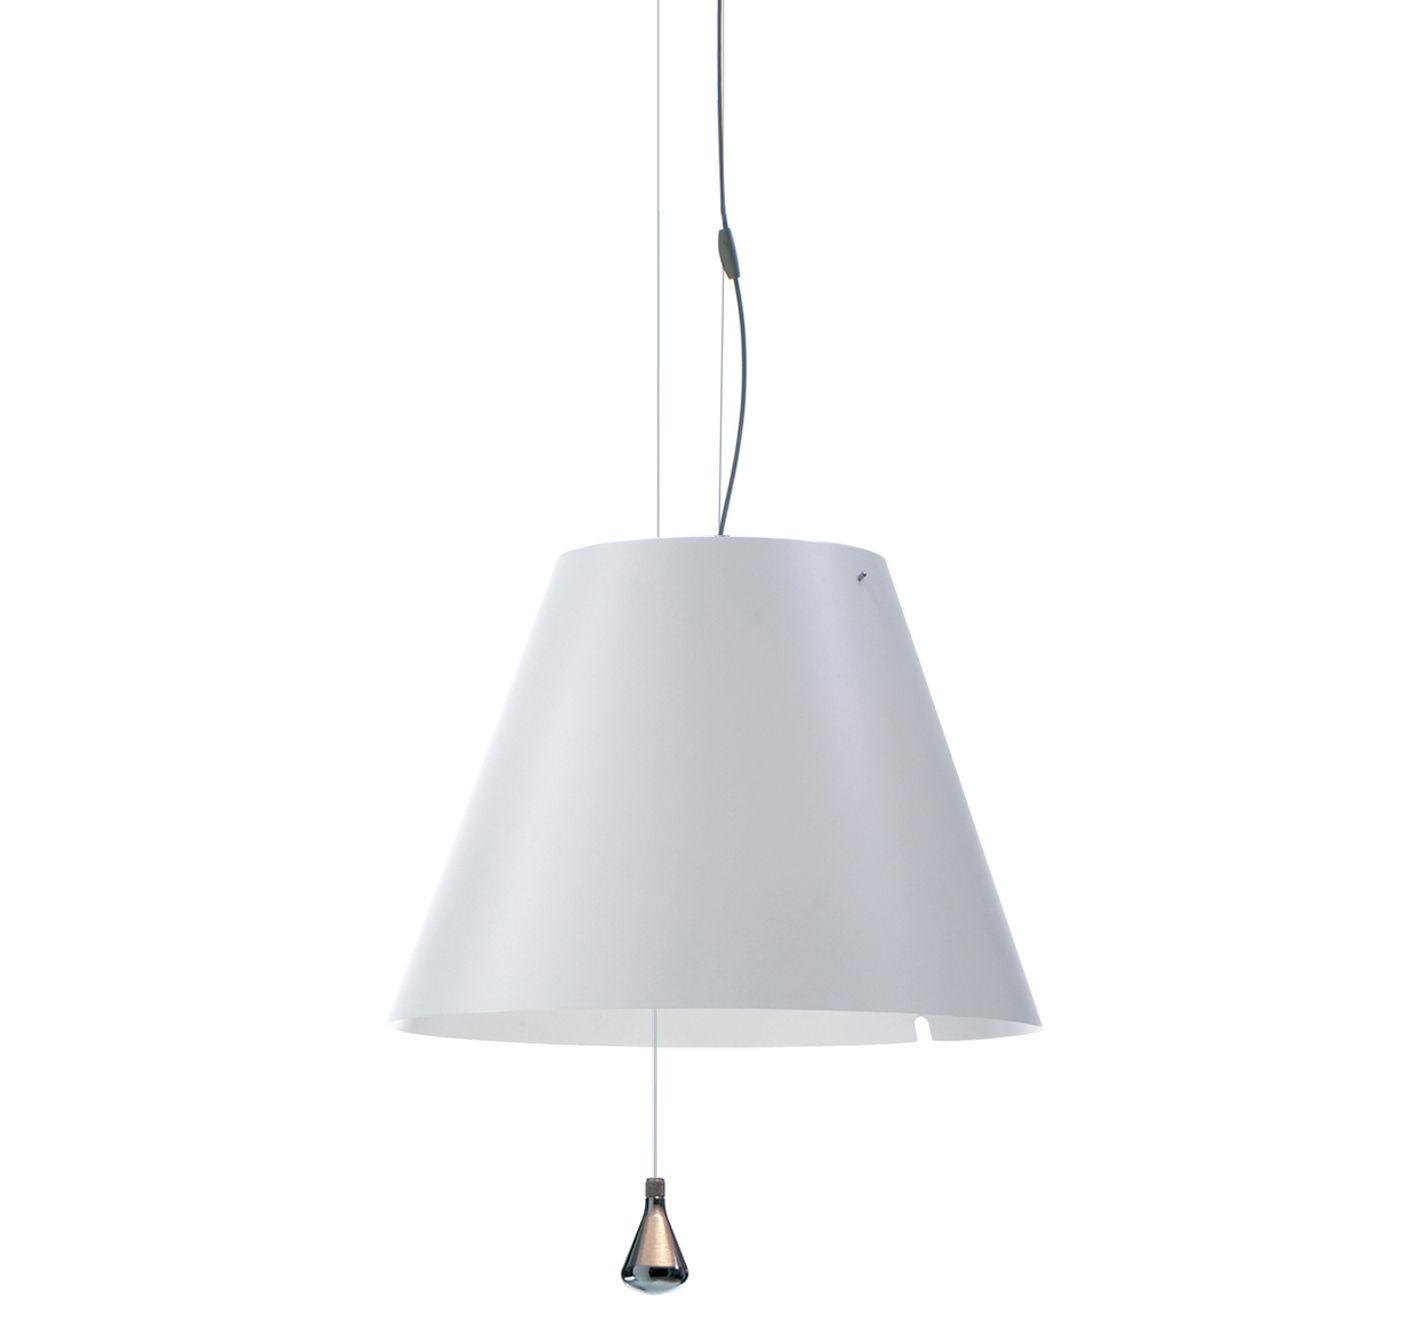 Luminaire - Suspensions - Suspension Lady Costanza / Ø 50 cm x H 35 cm - Luceplan - Blanc - Polycarbonate